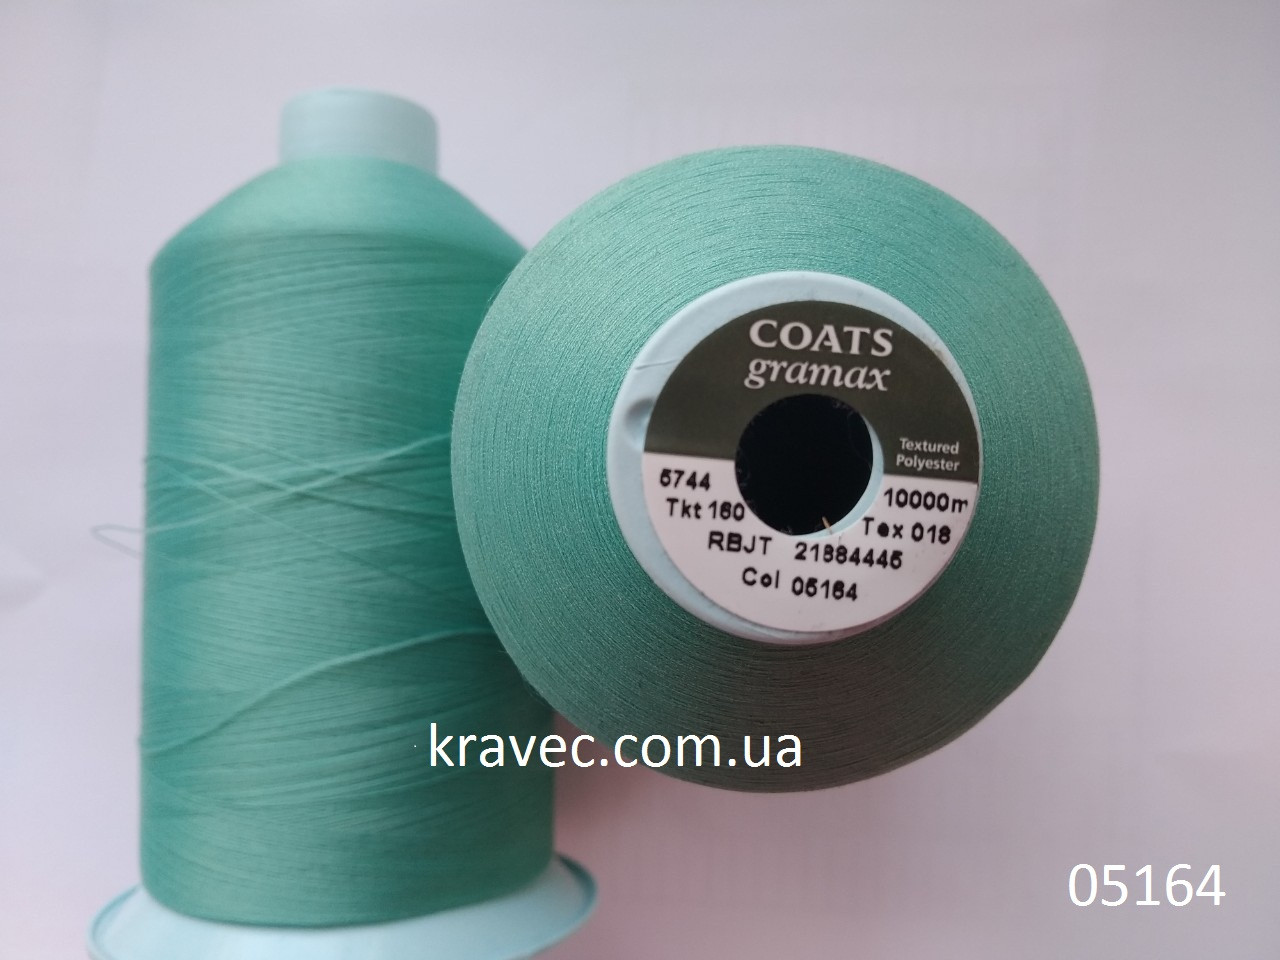 Текстурована нитка Coats gramax 05164/160/ 10000м молочний